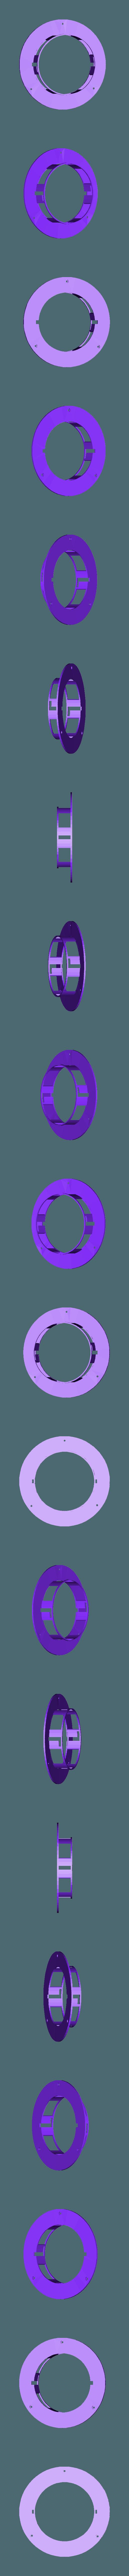 Home_Mini_Mount_Outer.stl Download free STL file Google Home Mini Ceiling Mount Thicker Rings • 3D printer design, crisonescu